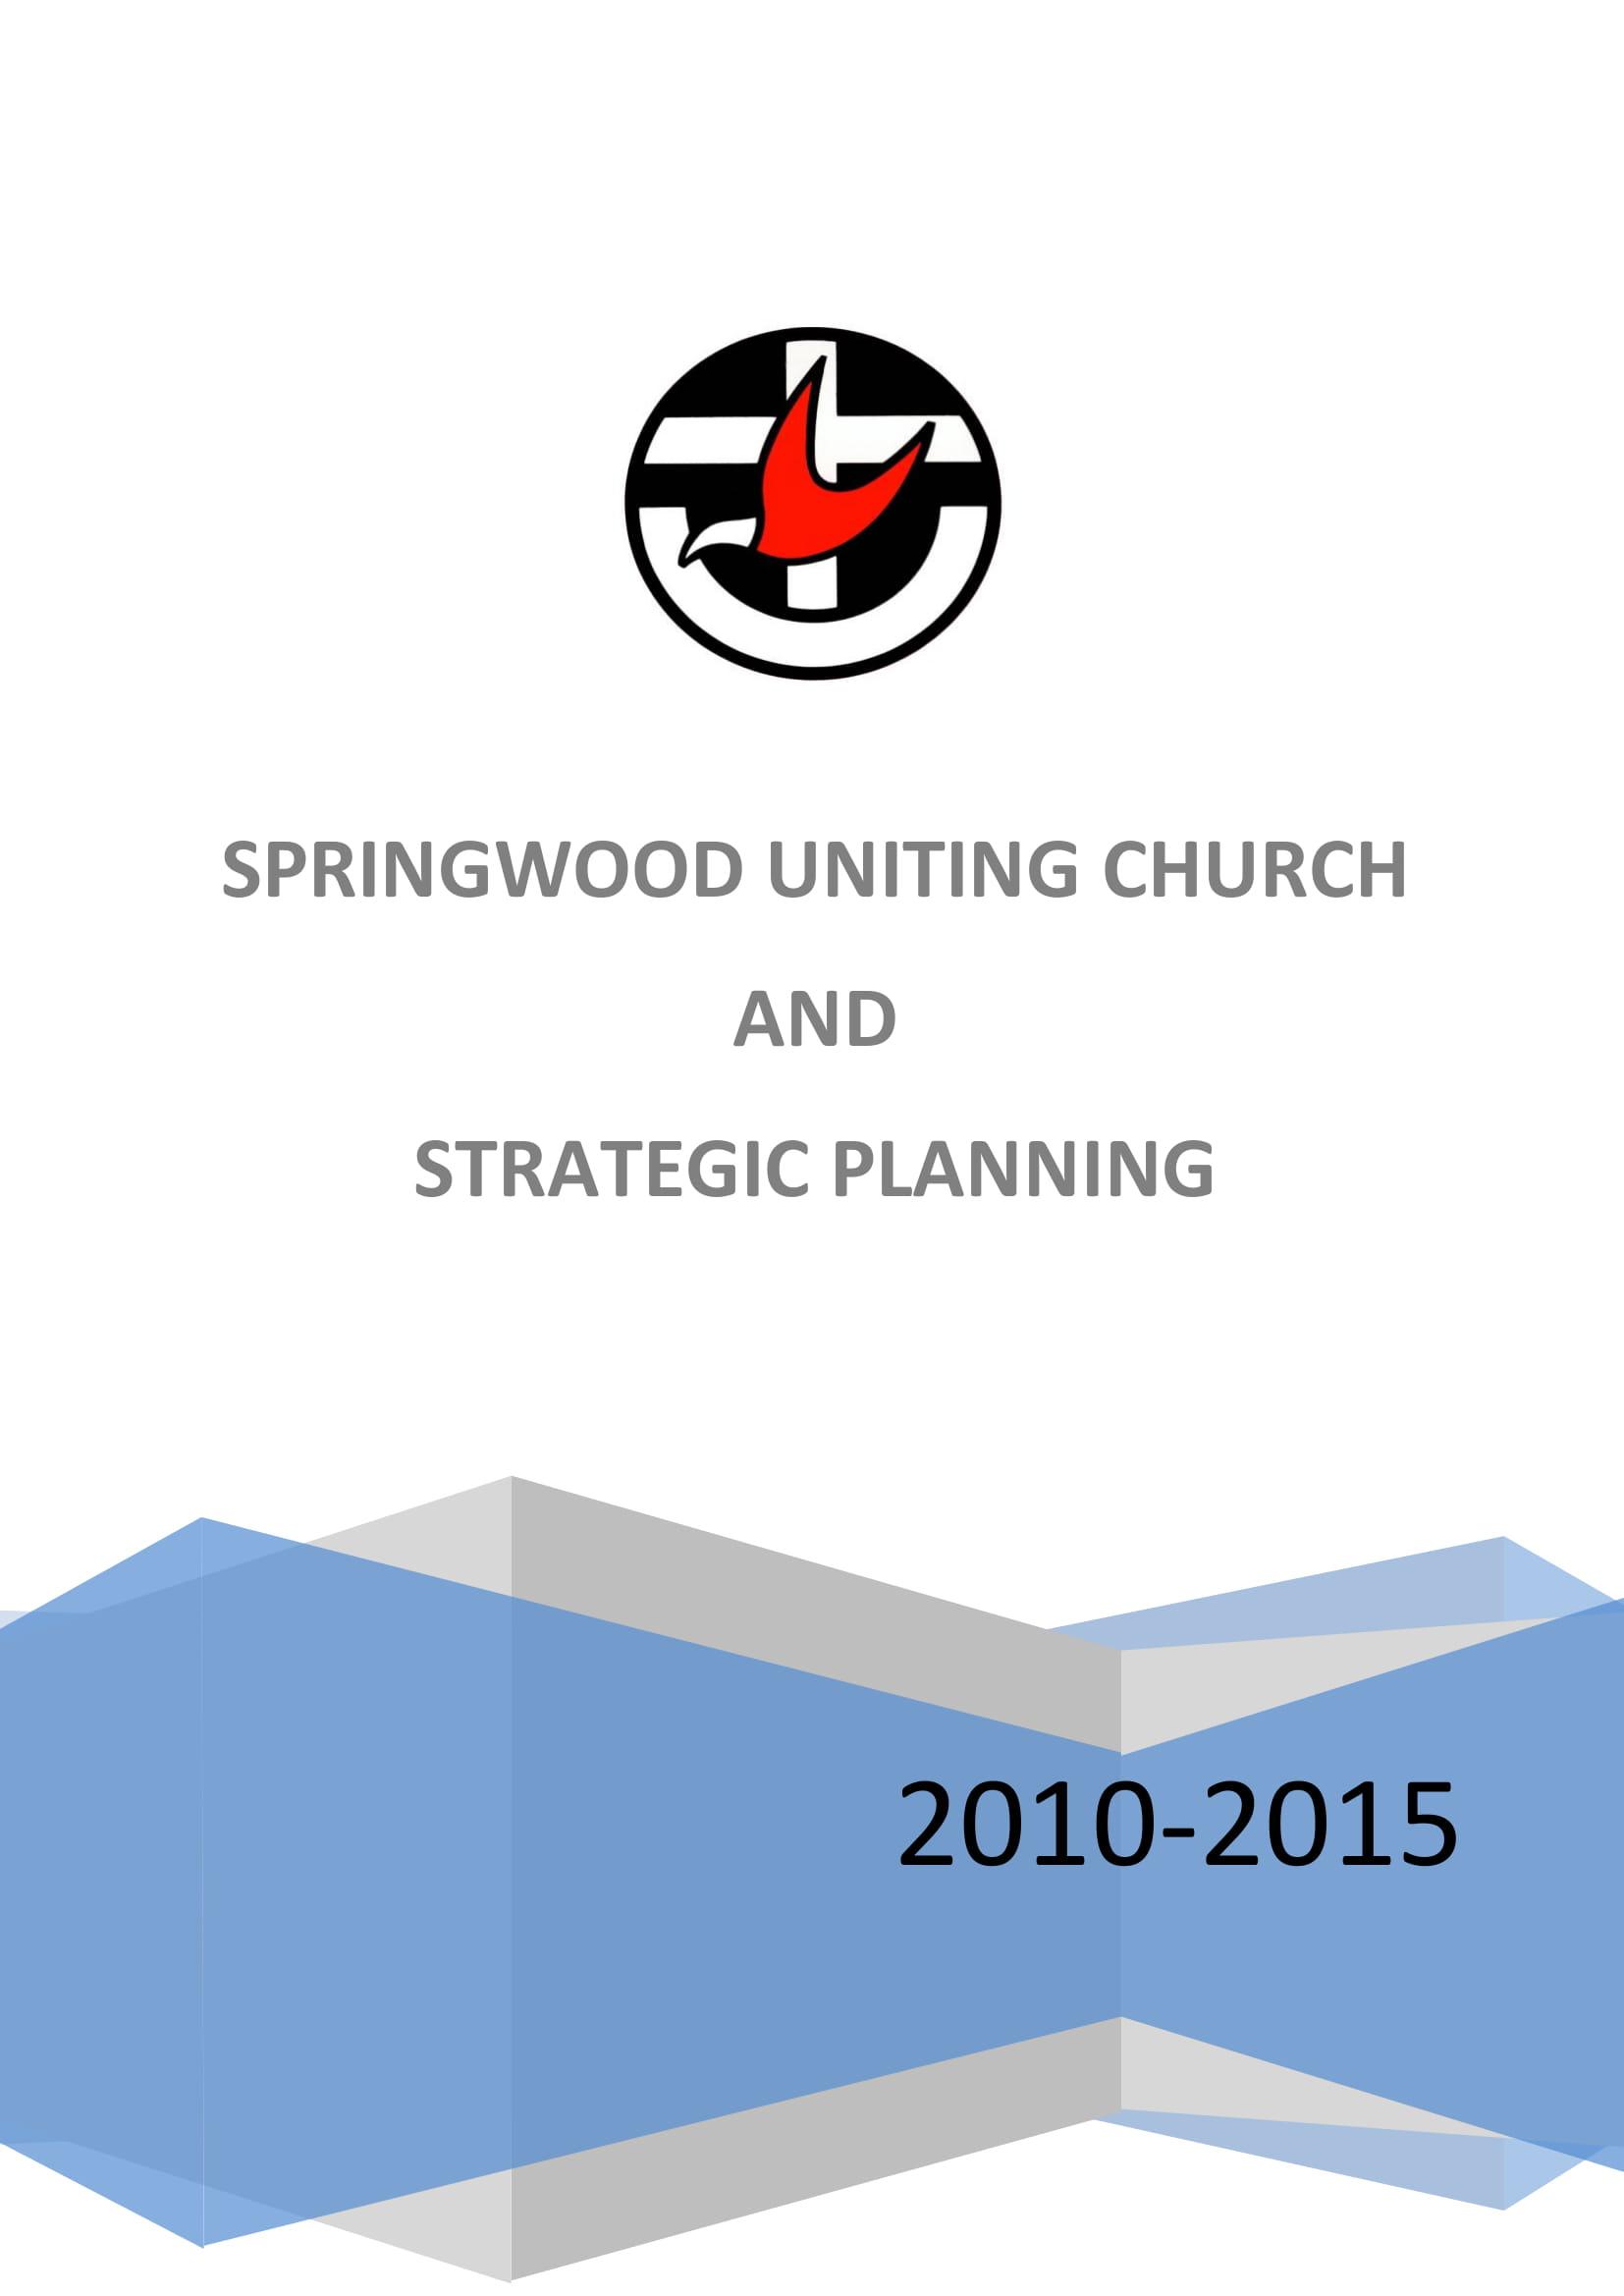 church strategic planning example 01